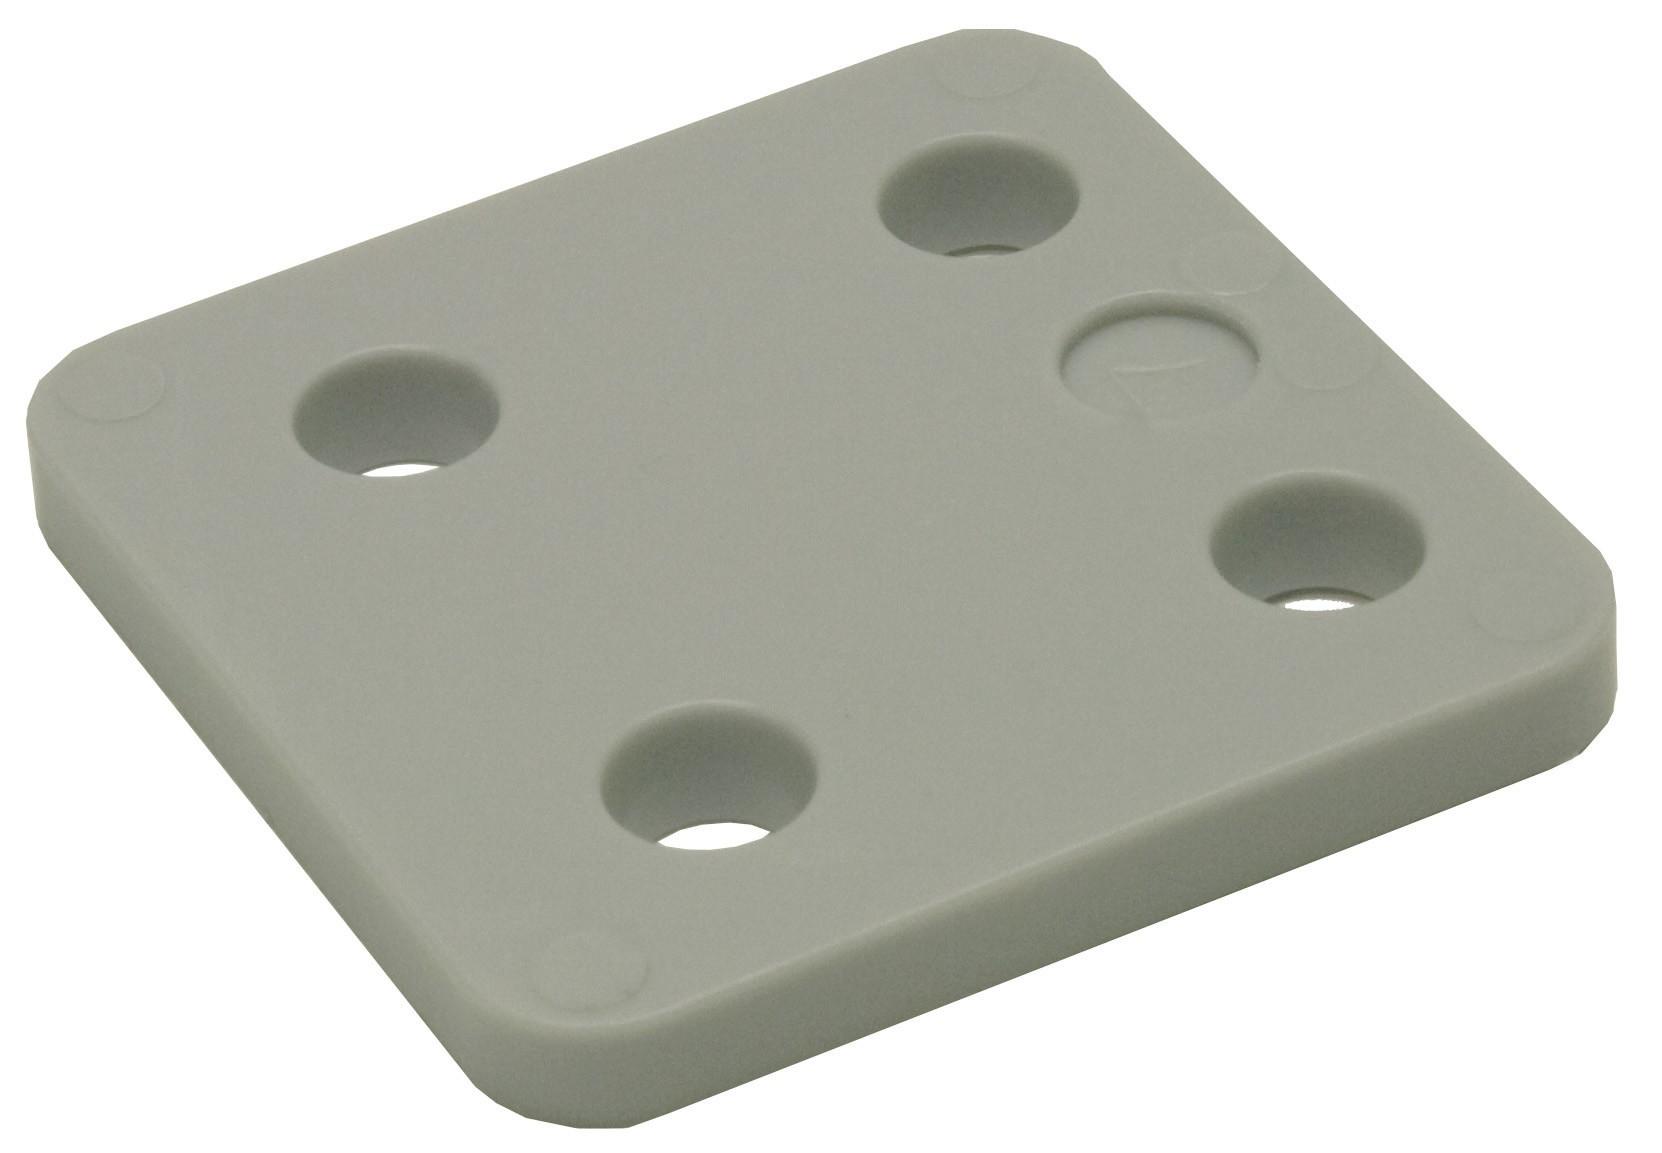 Pressure plate 7 70x70 KS